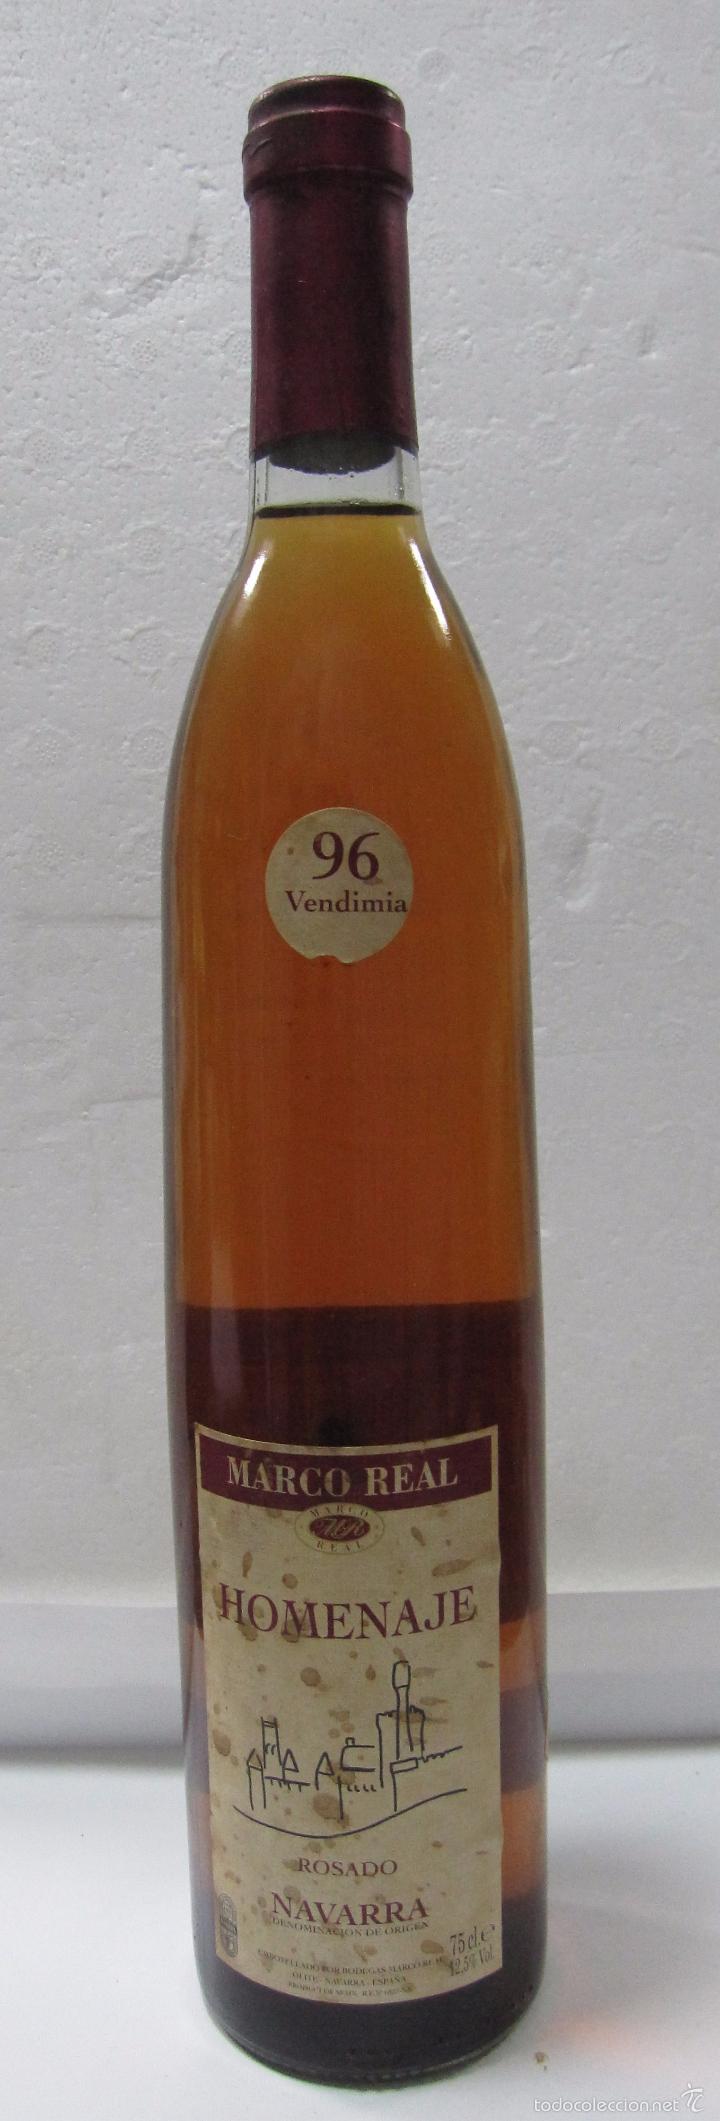 botella de vino rosado. homenaje. bodegas marco - Comprar ...